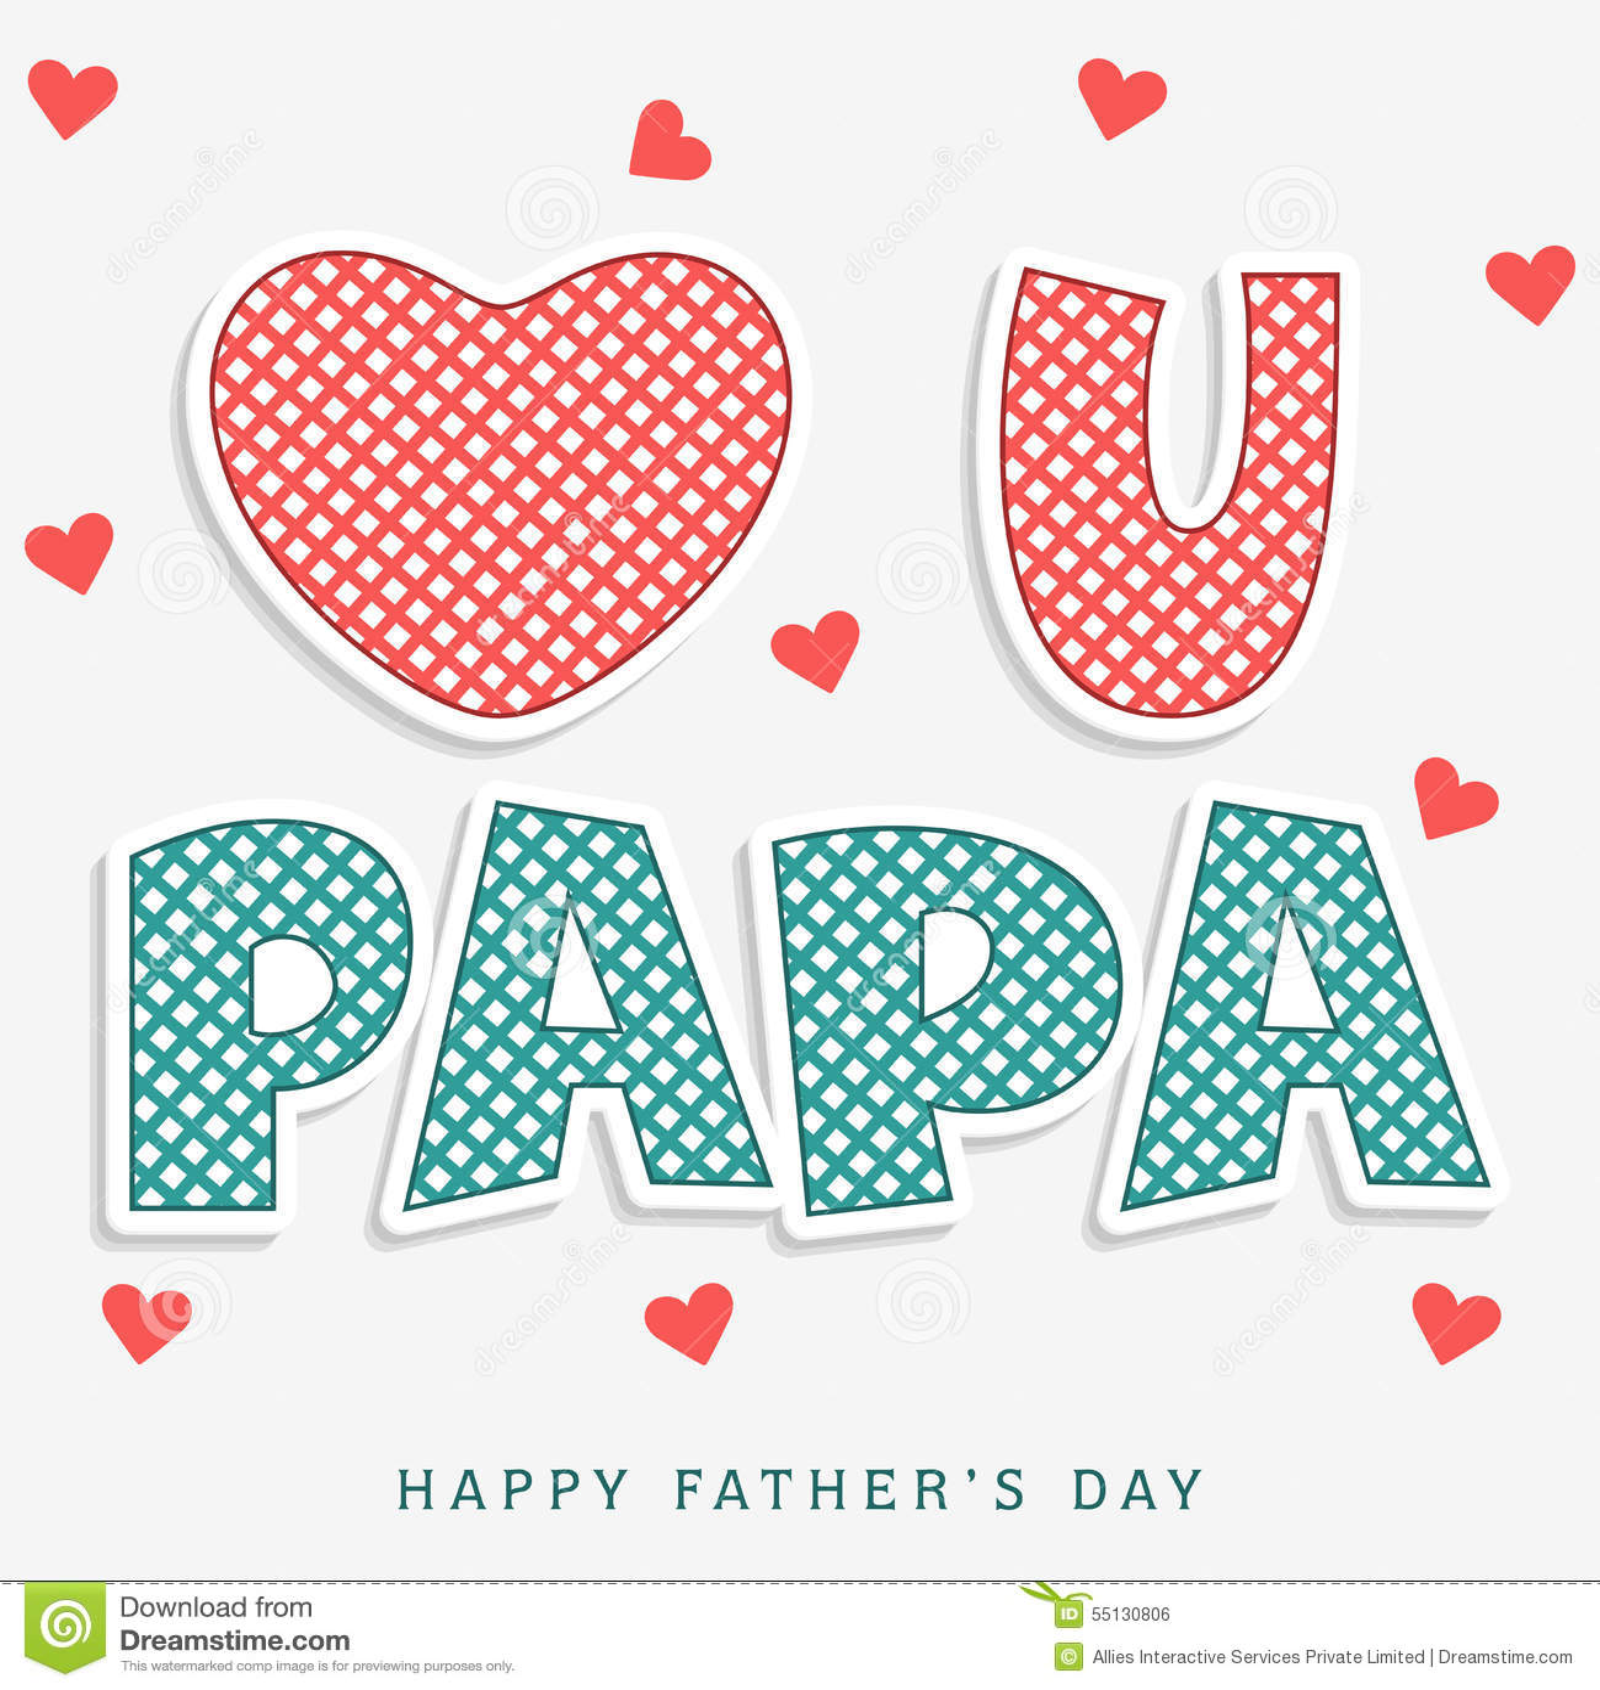 Stylish Text For Happy Fathers Day Celebration Stock Illustration